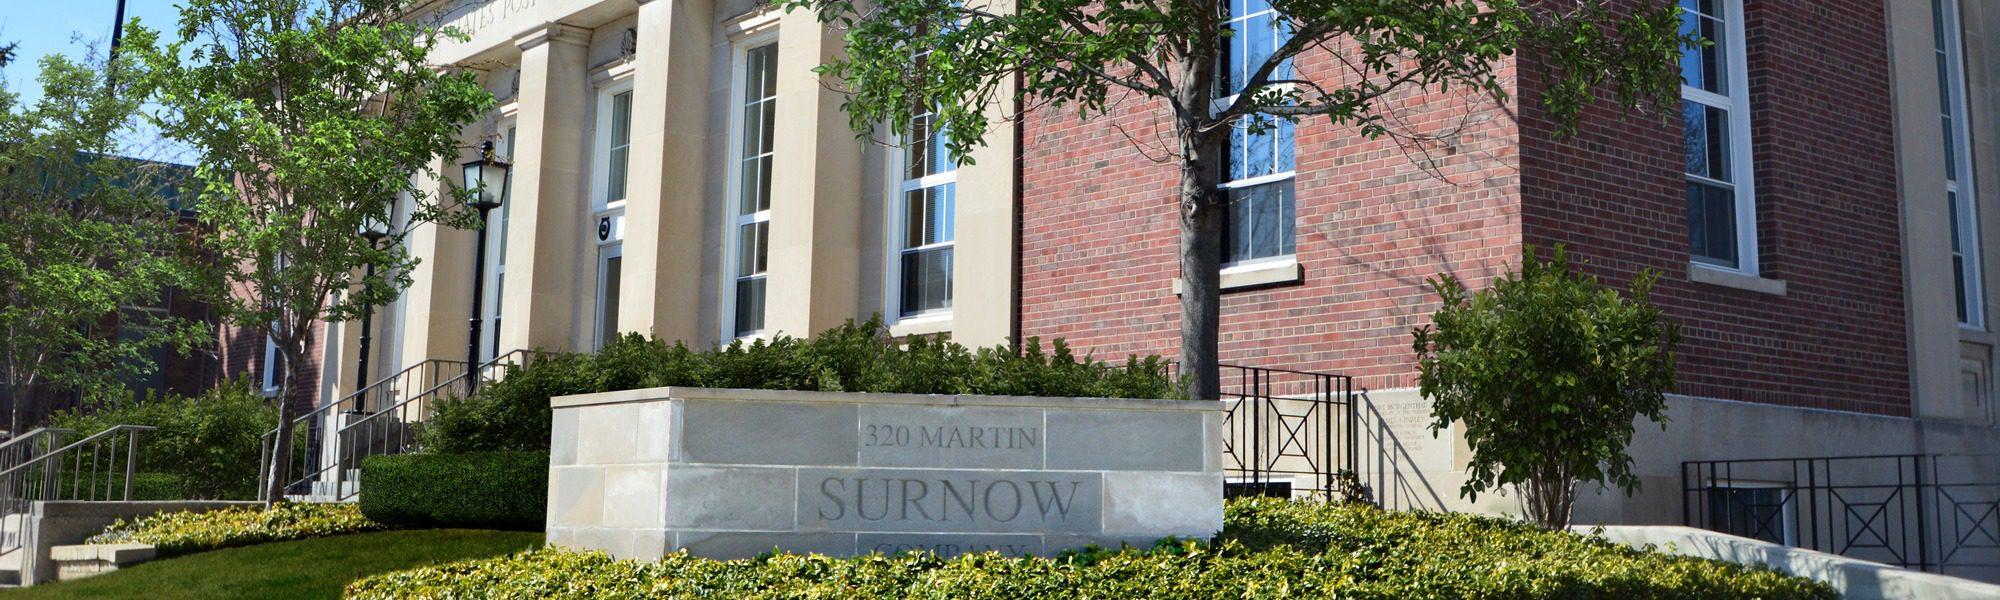 Surnow Building